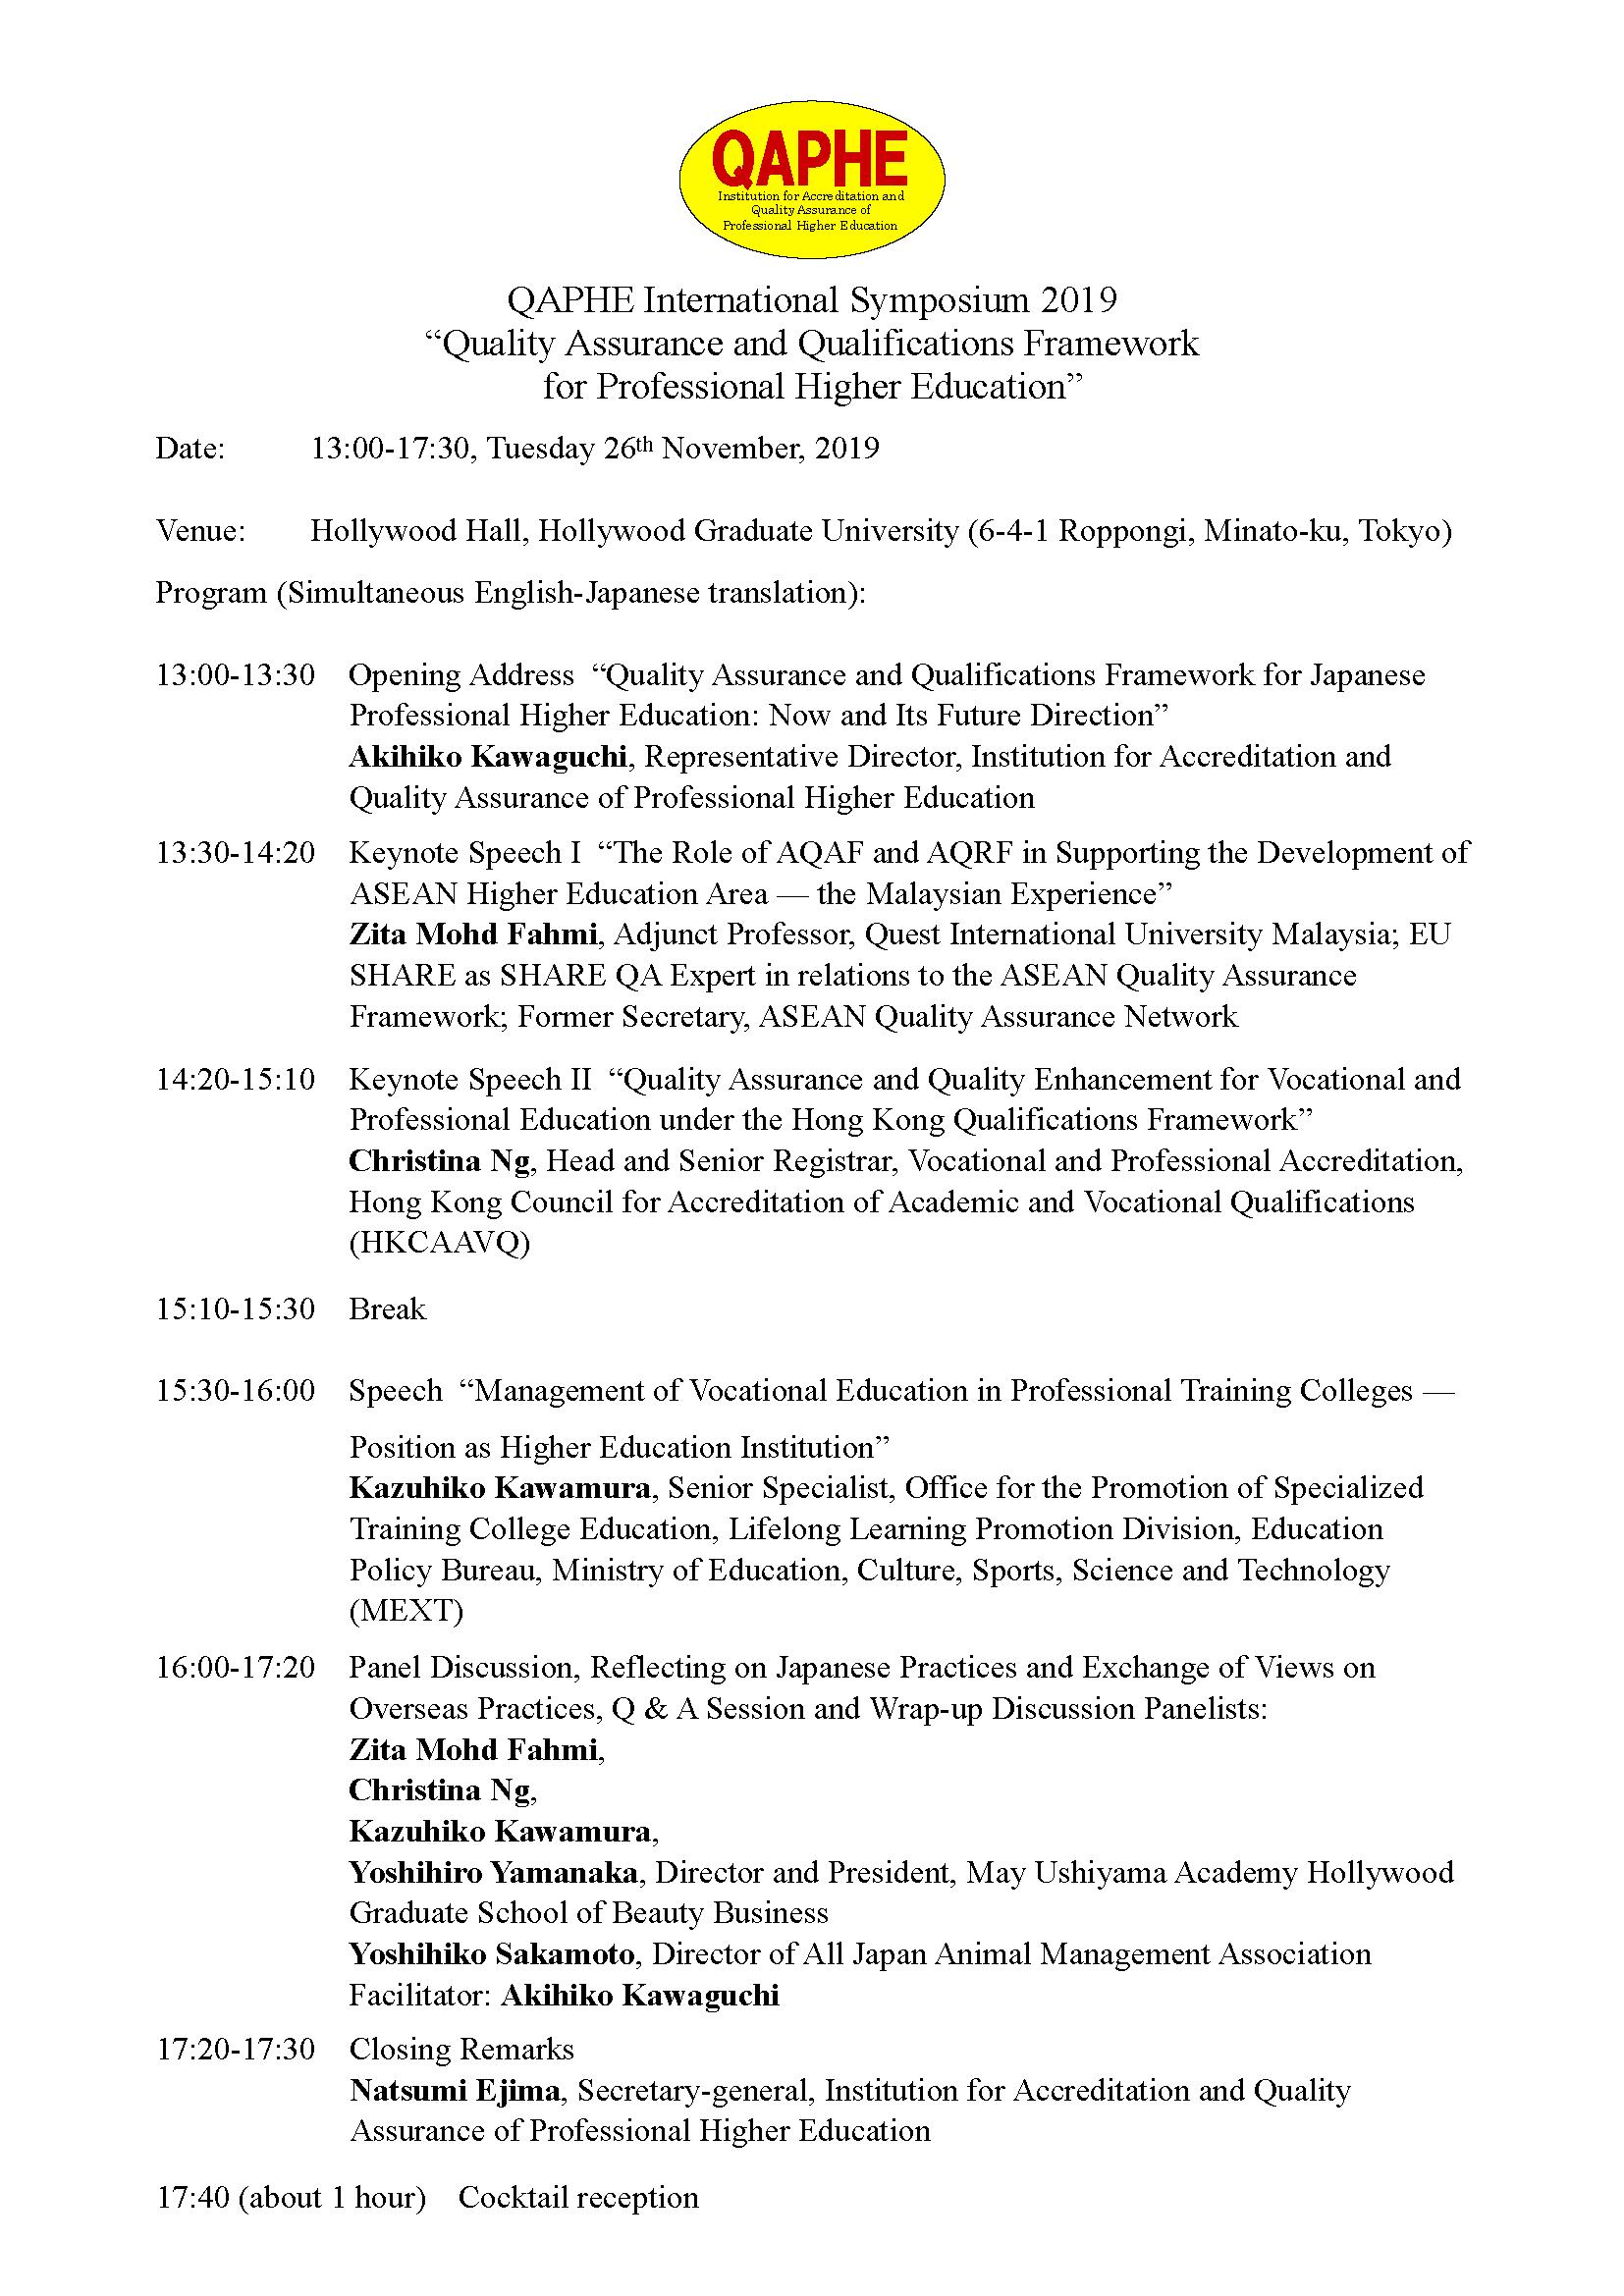 QAPHE国際シンポジウム2019プログラム(英文)